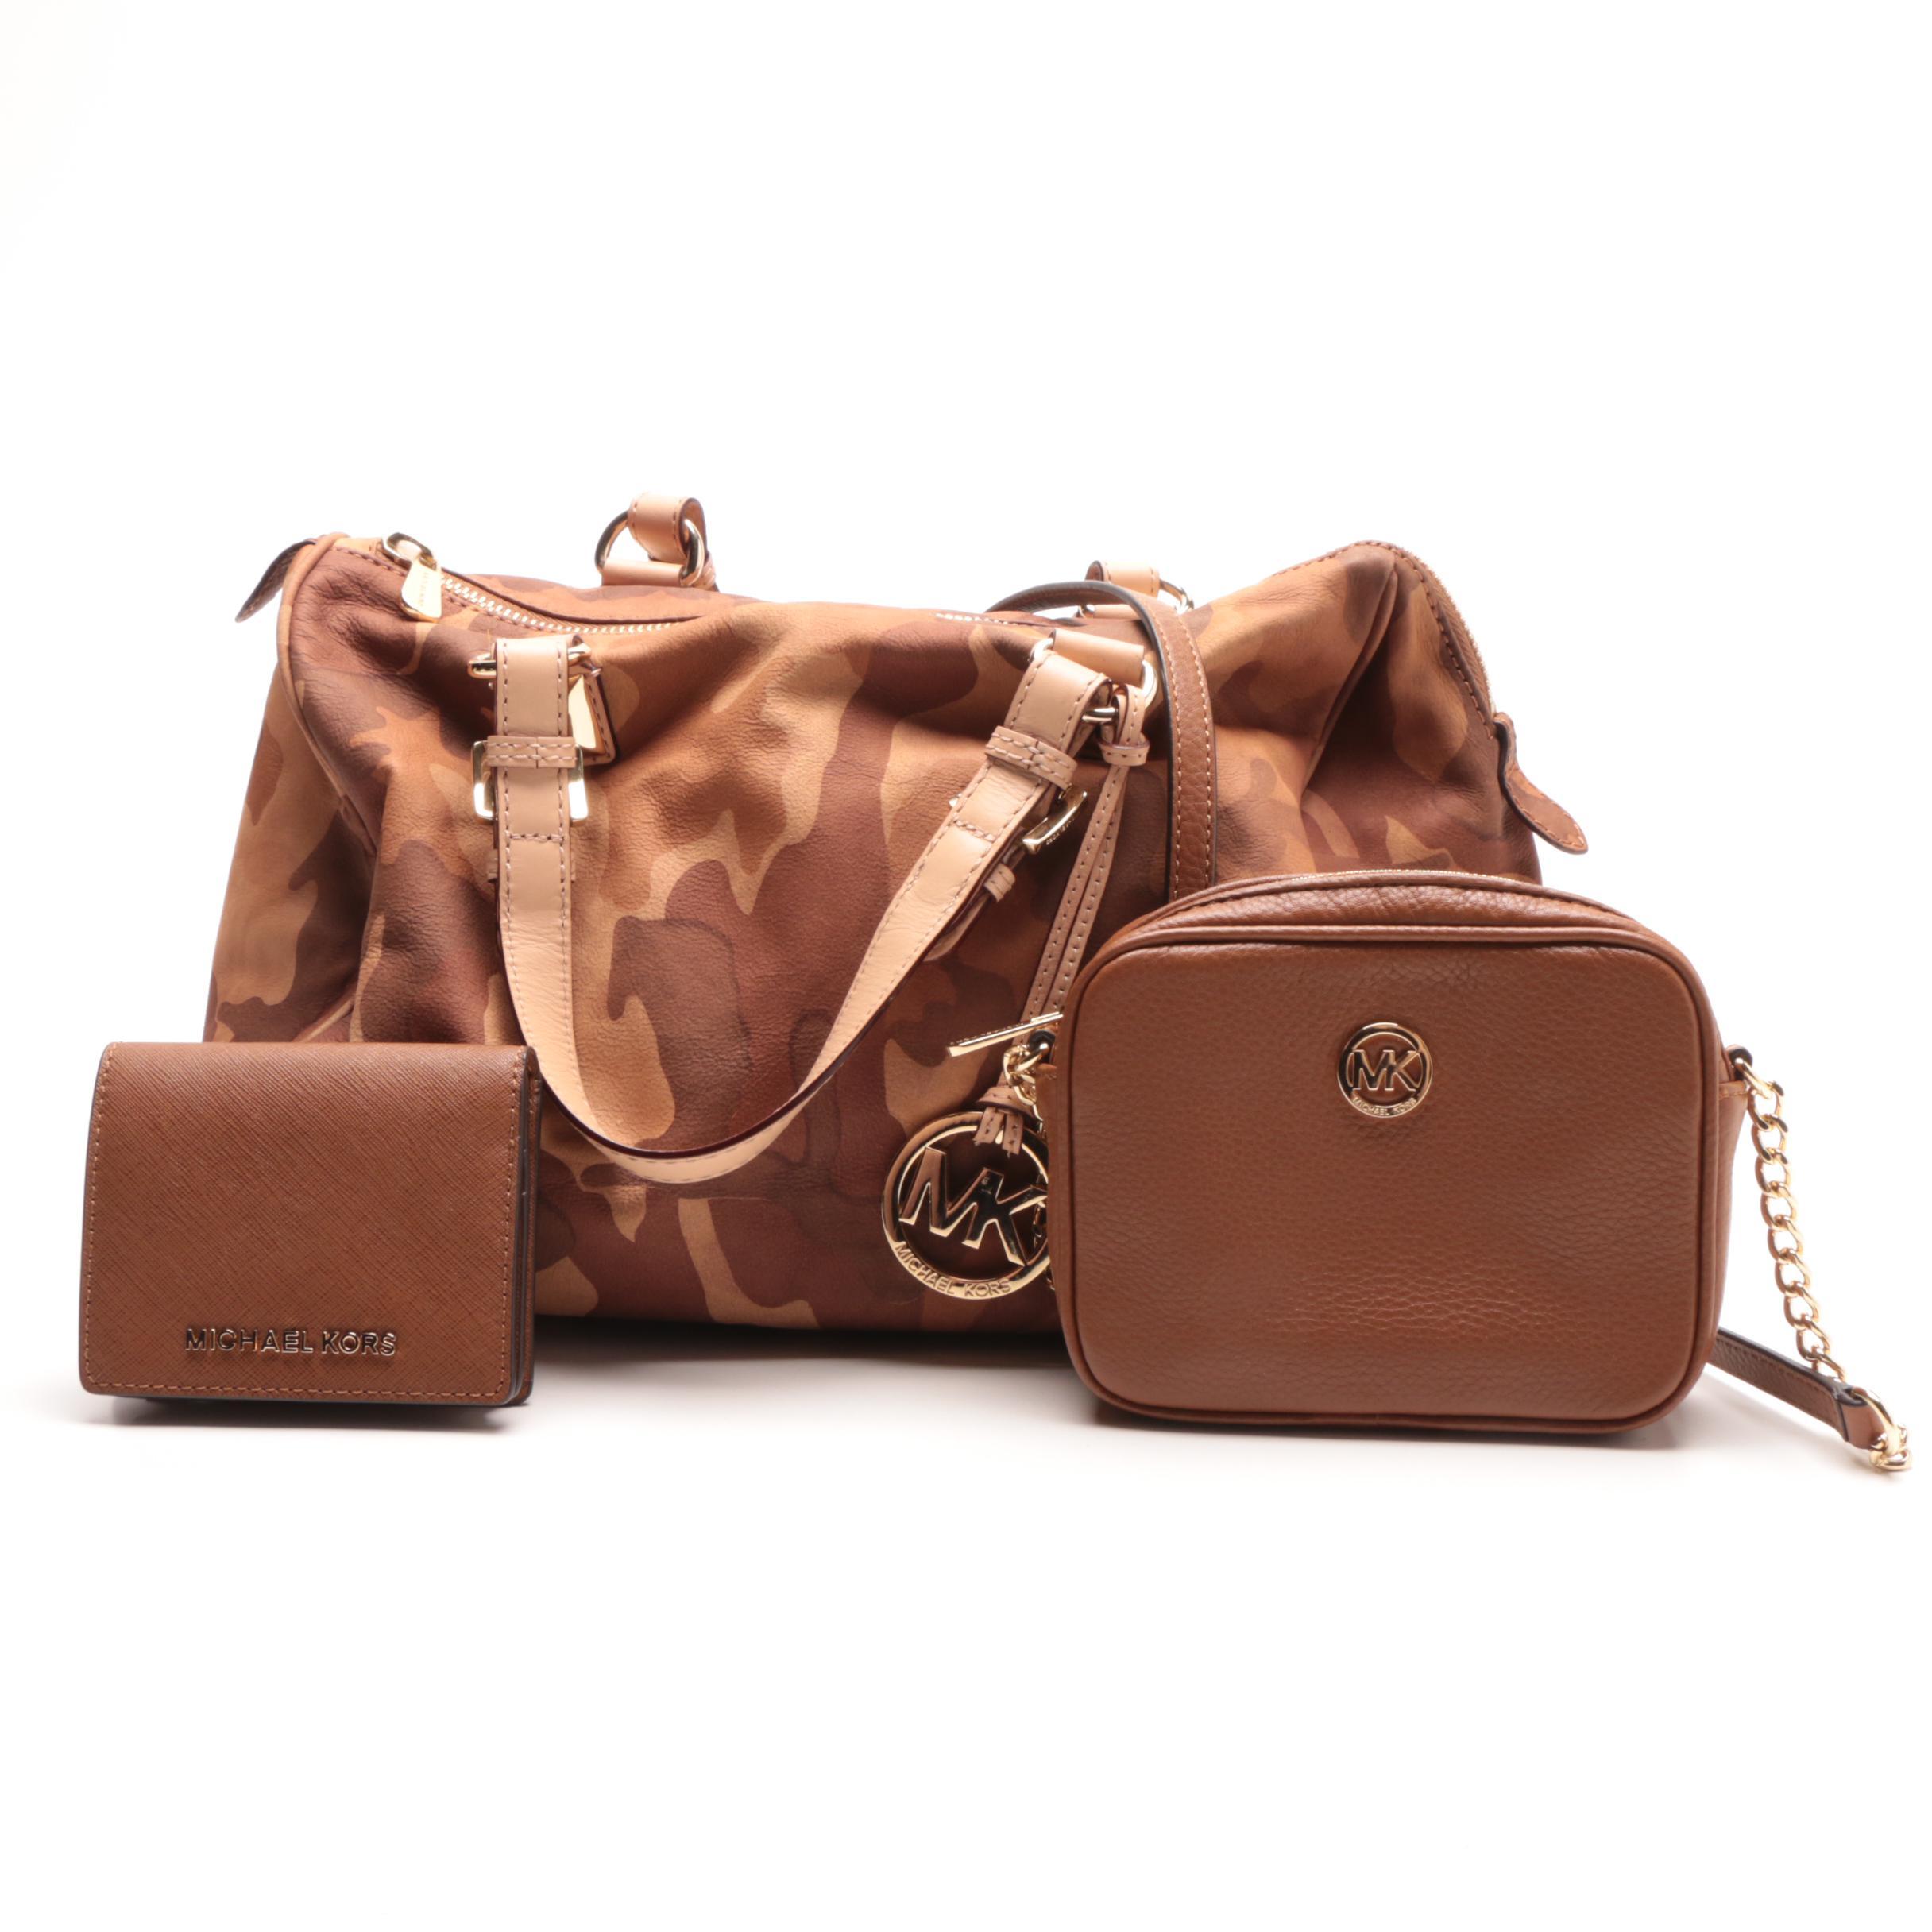 ec185cea3fa1 ... australia usa michael michael kors grayson brown camo satchel and other  accessories 0bdd6 9fa14 28827 54b55